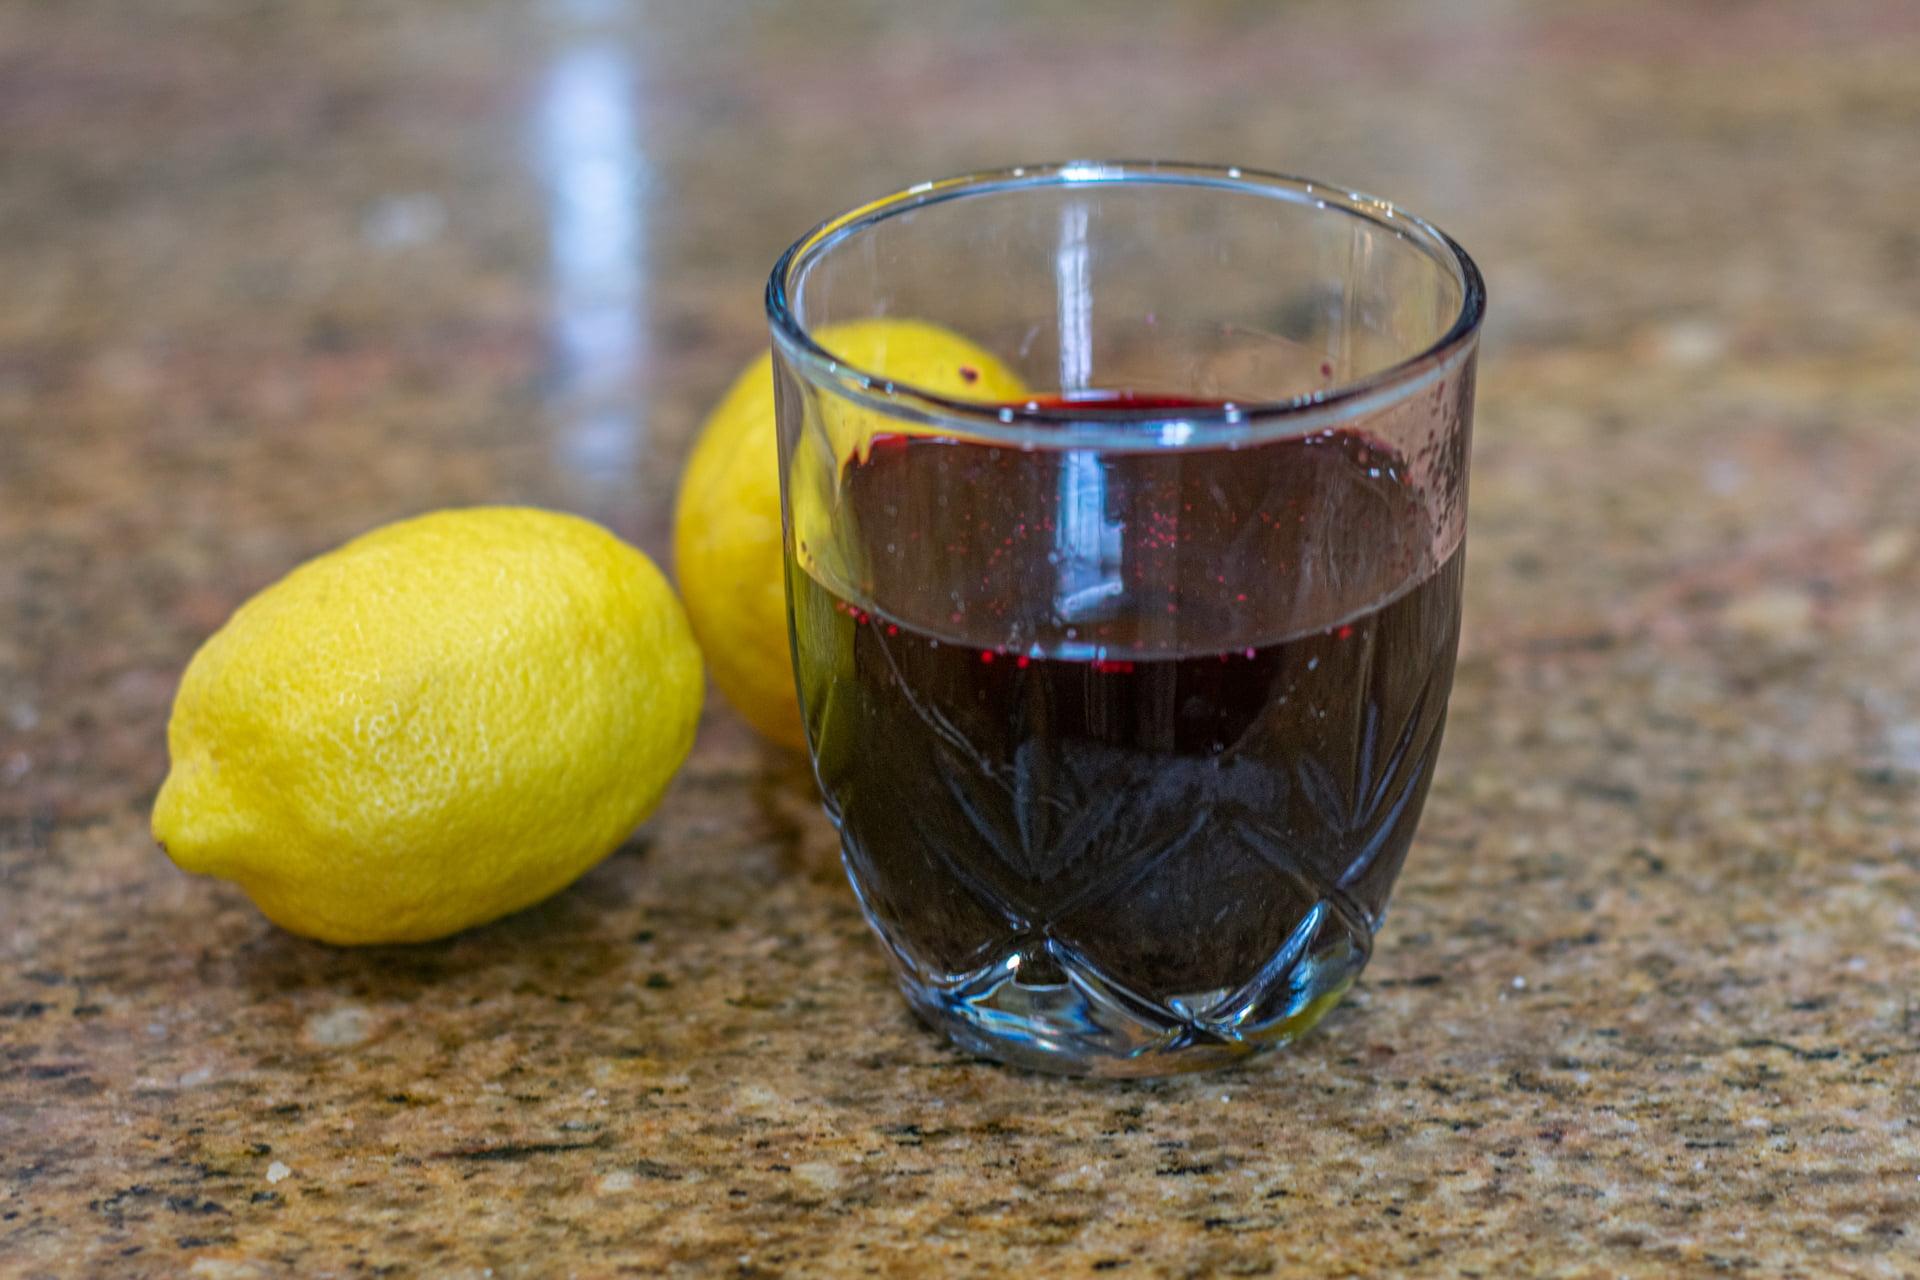 Small glass of Blueberry Lemonade